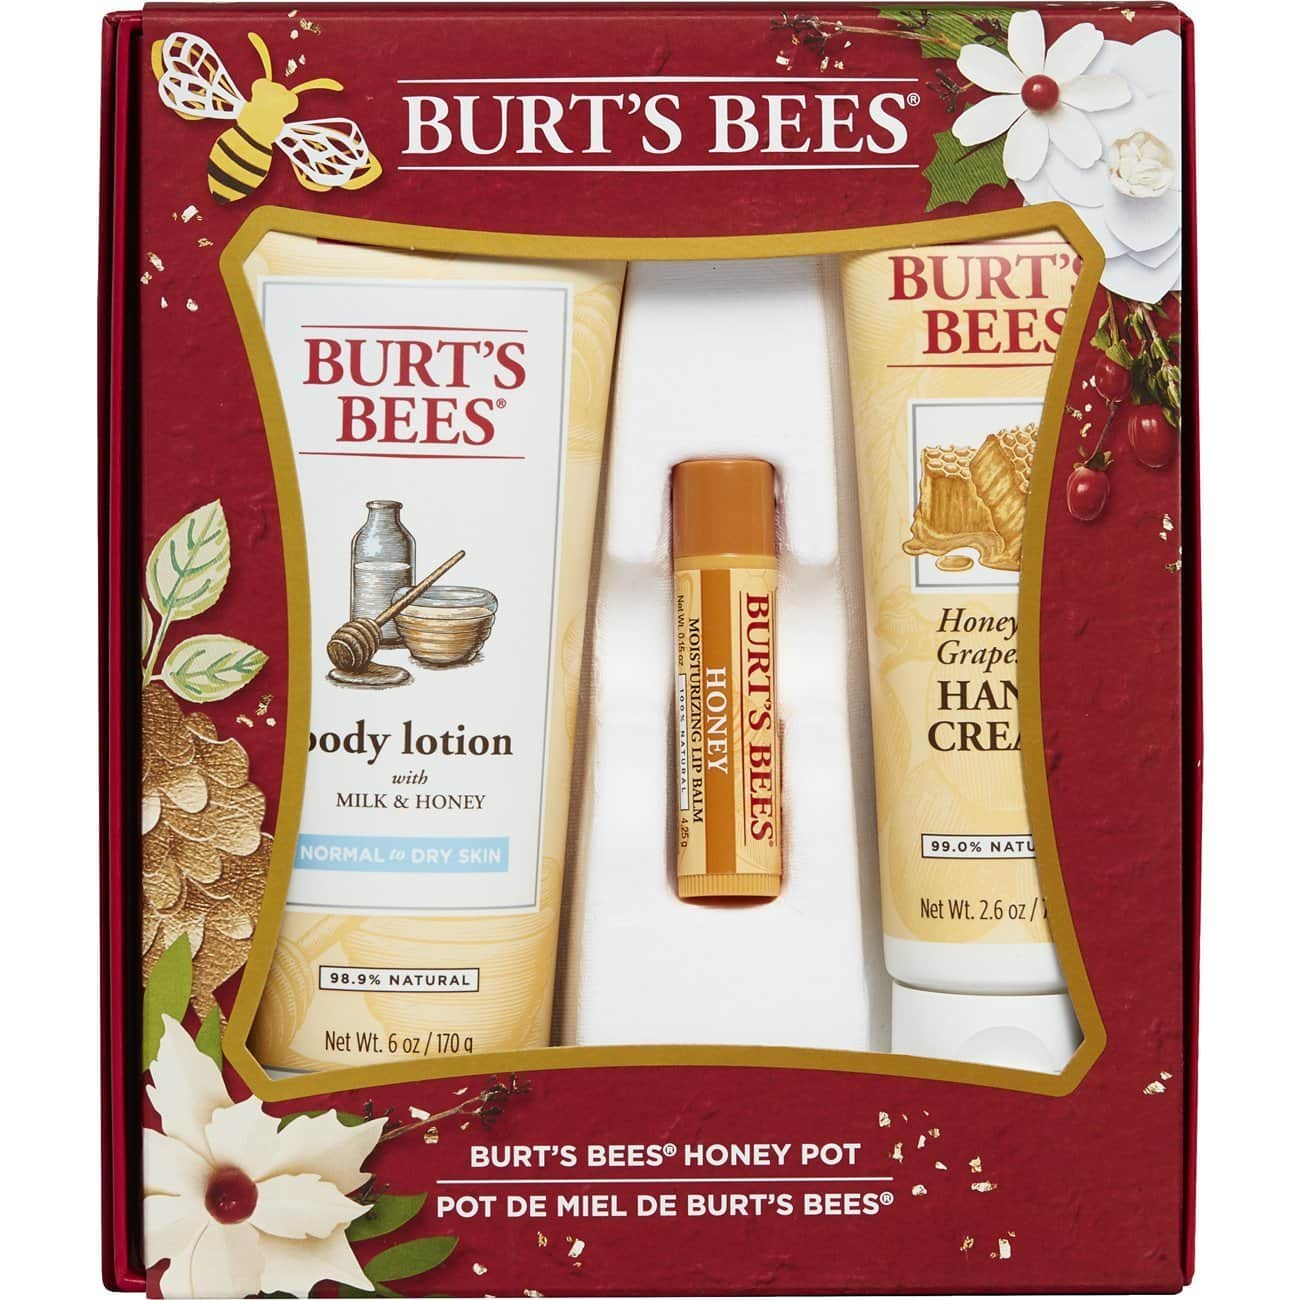 Burt's bees Honey Pot 3 piece gift set $4.48 W/Amazon Fresh